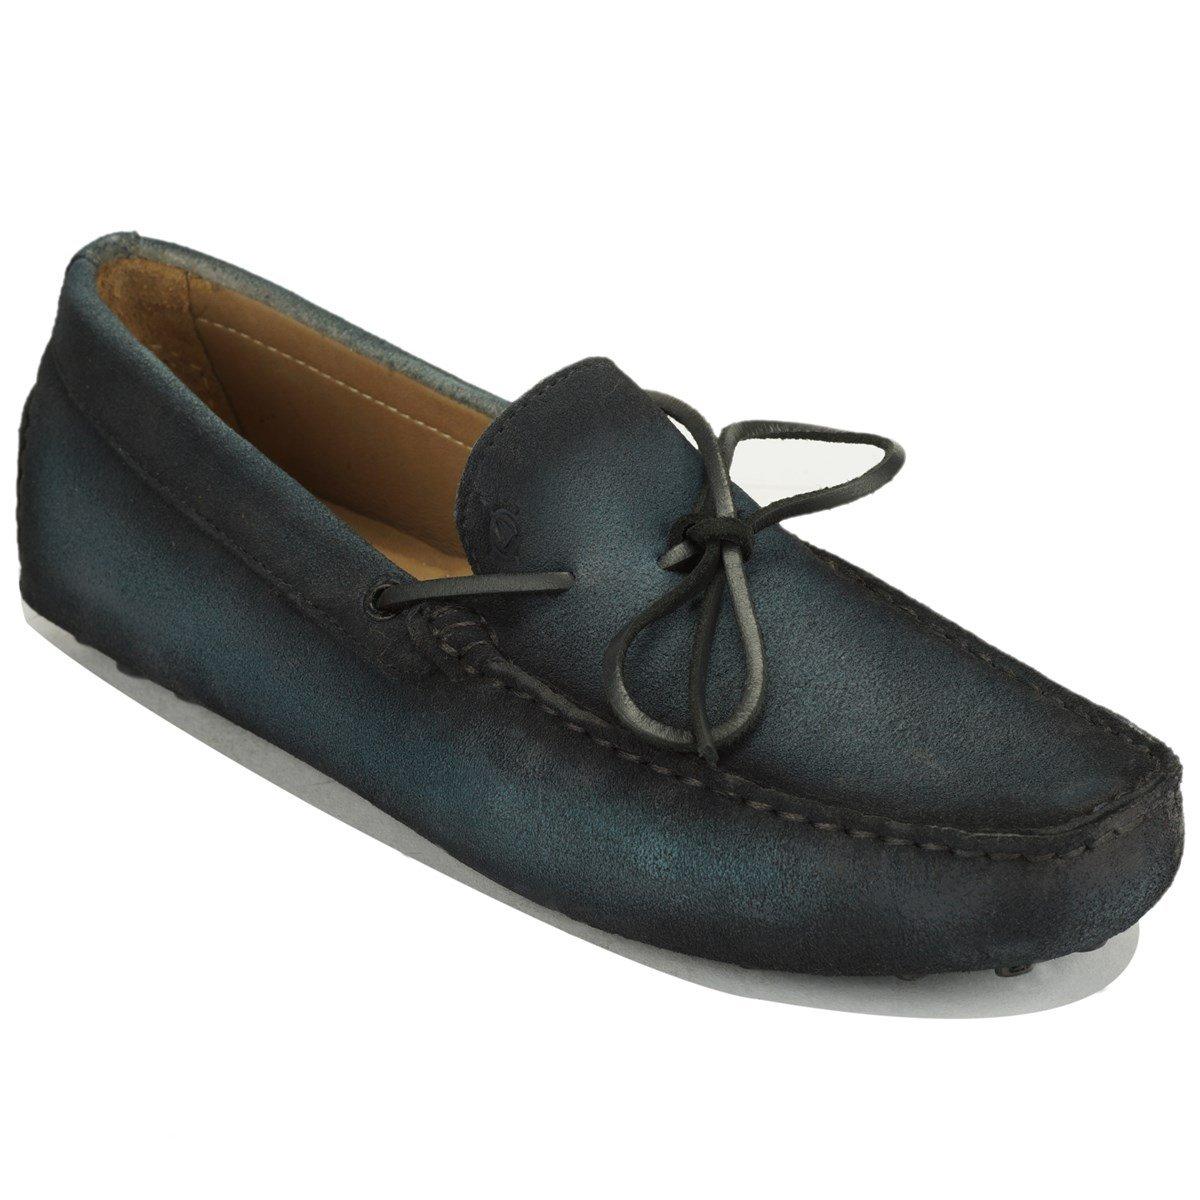 Scottwilliams Amati Premium Herren Bootsschuhe  P39|Marineblau